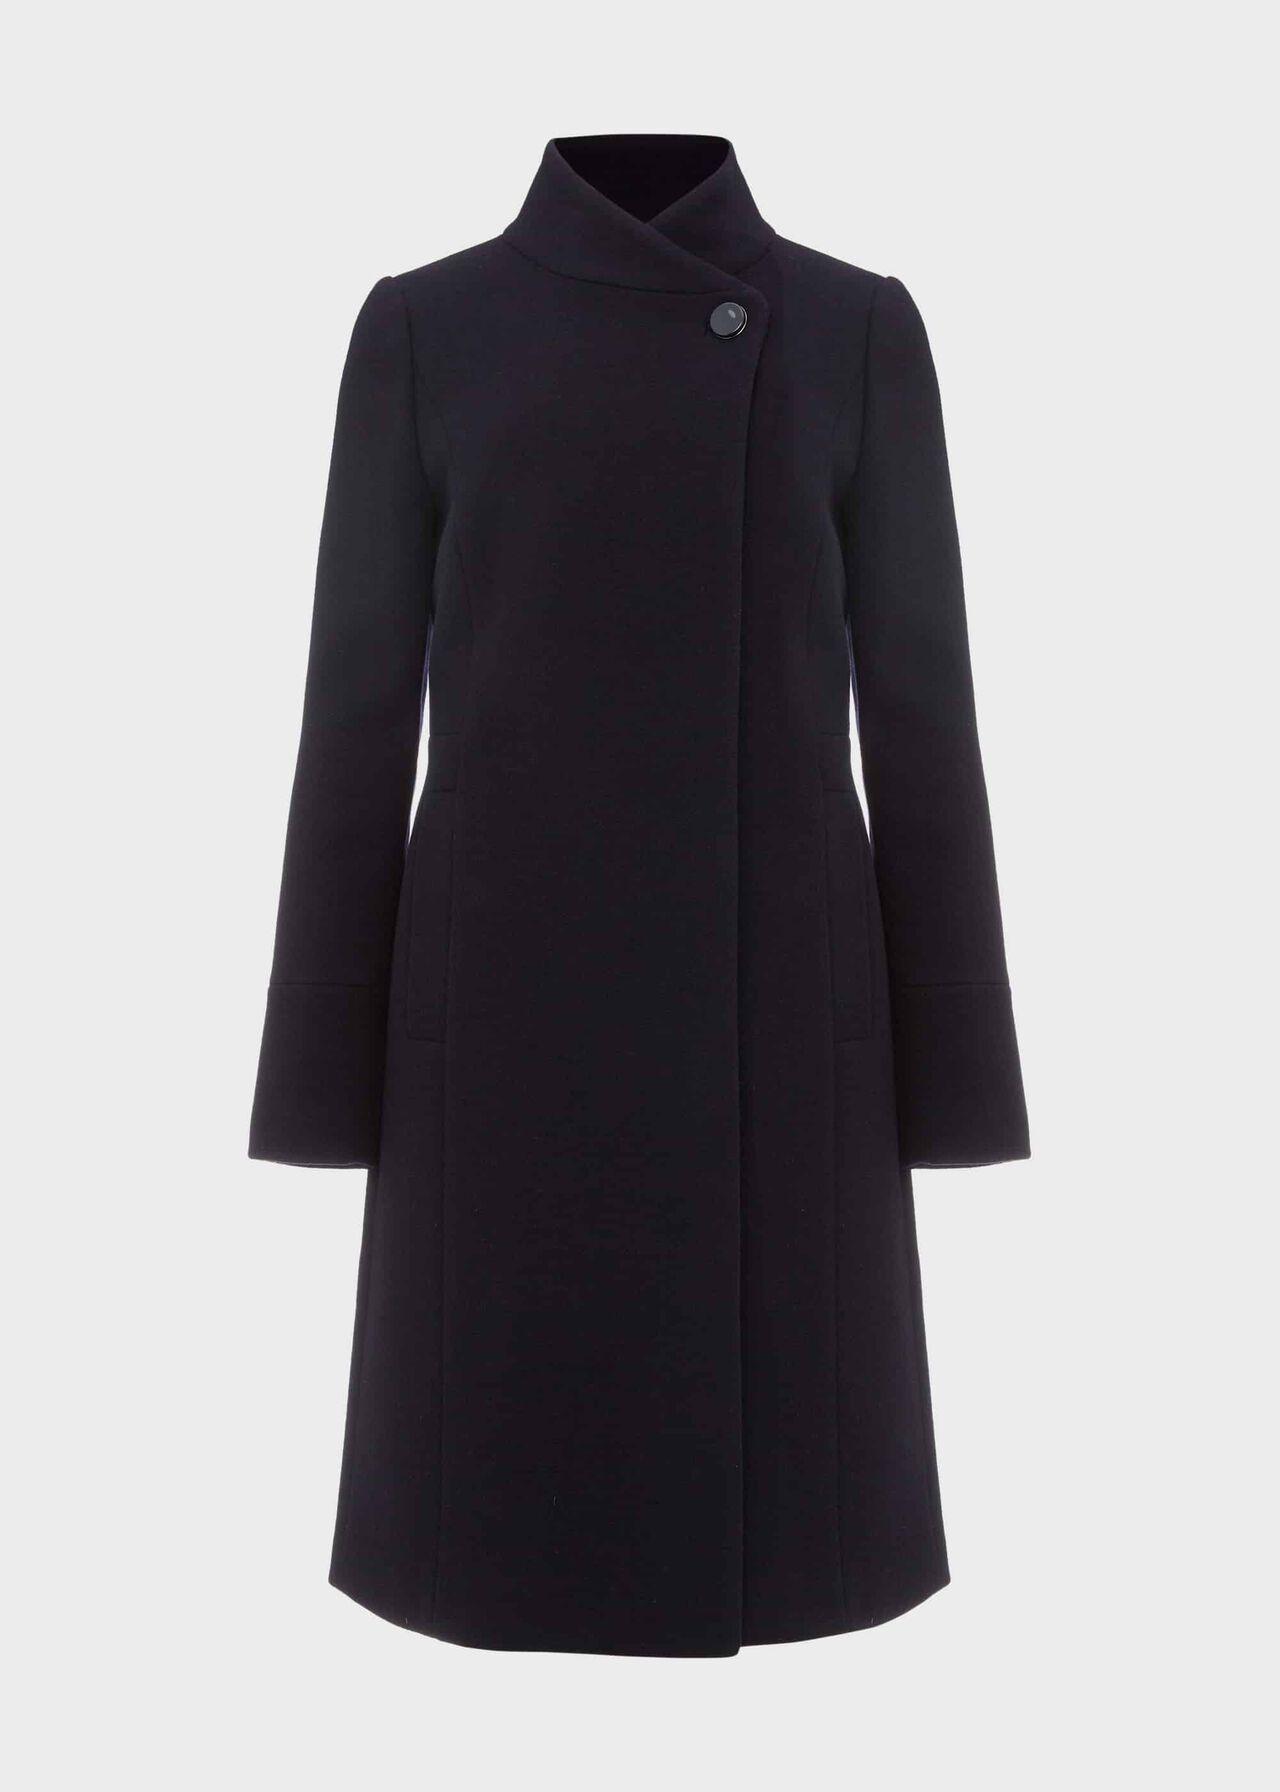 Petite Maisie Wool Blend Coat Navy